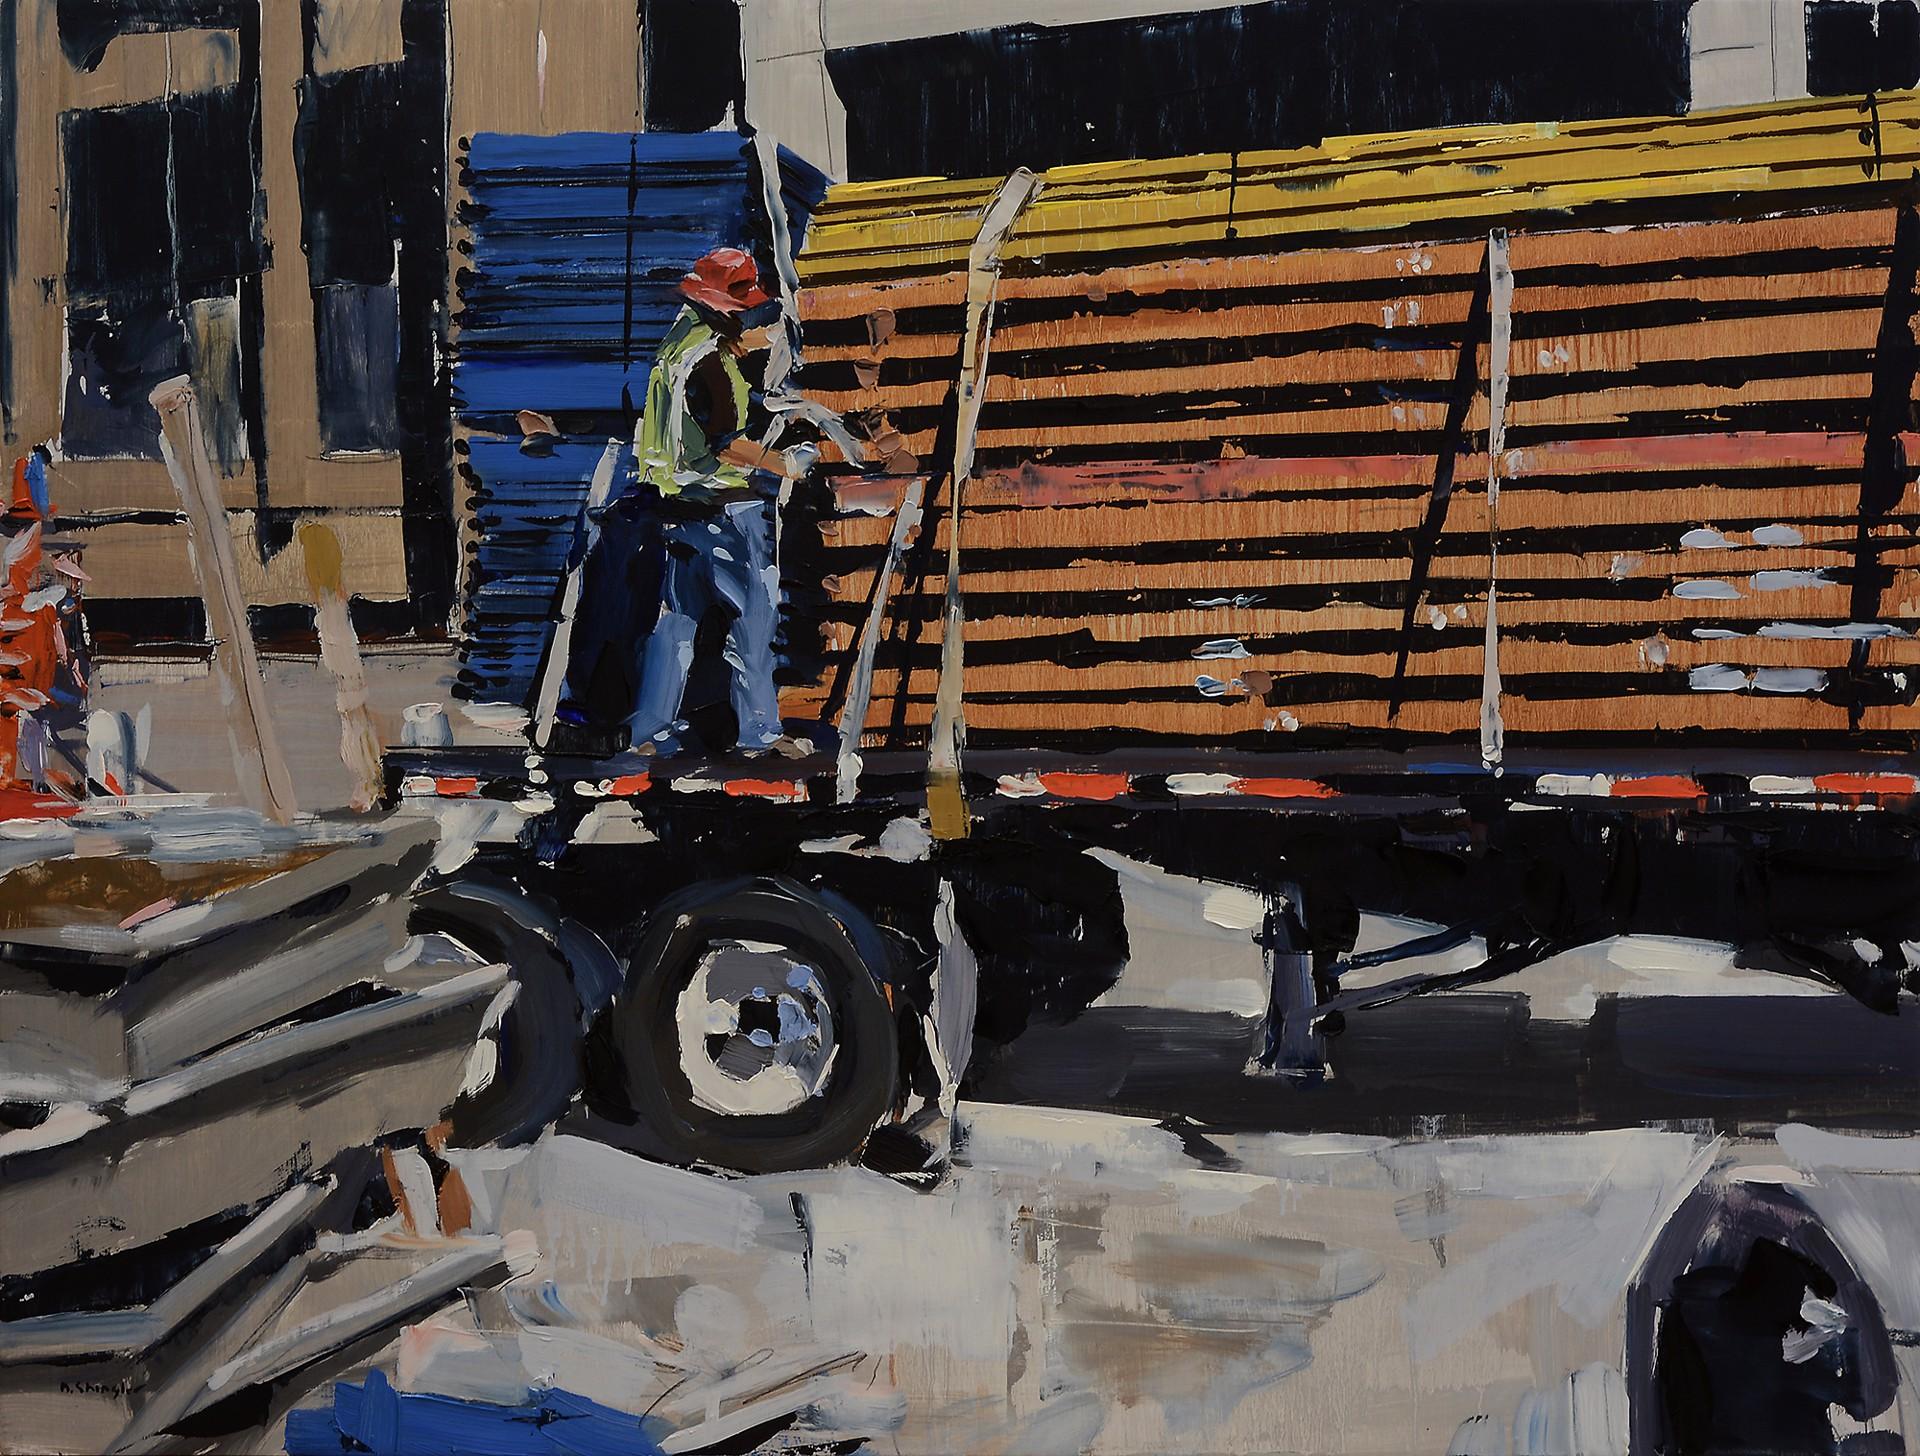 Man on Truck by David Shingler